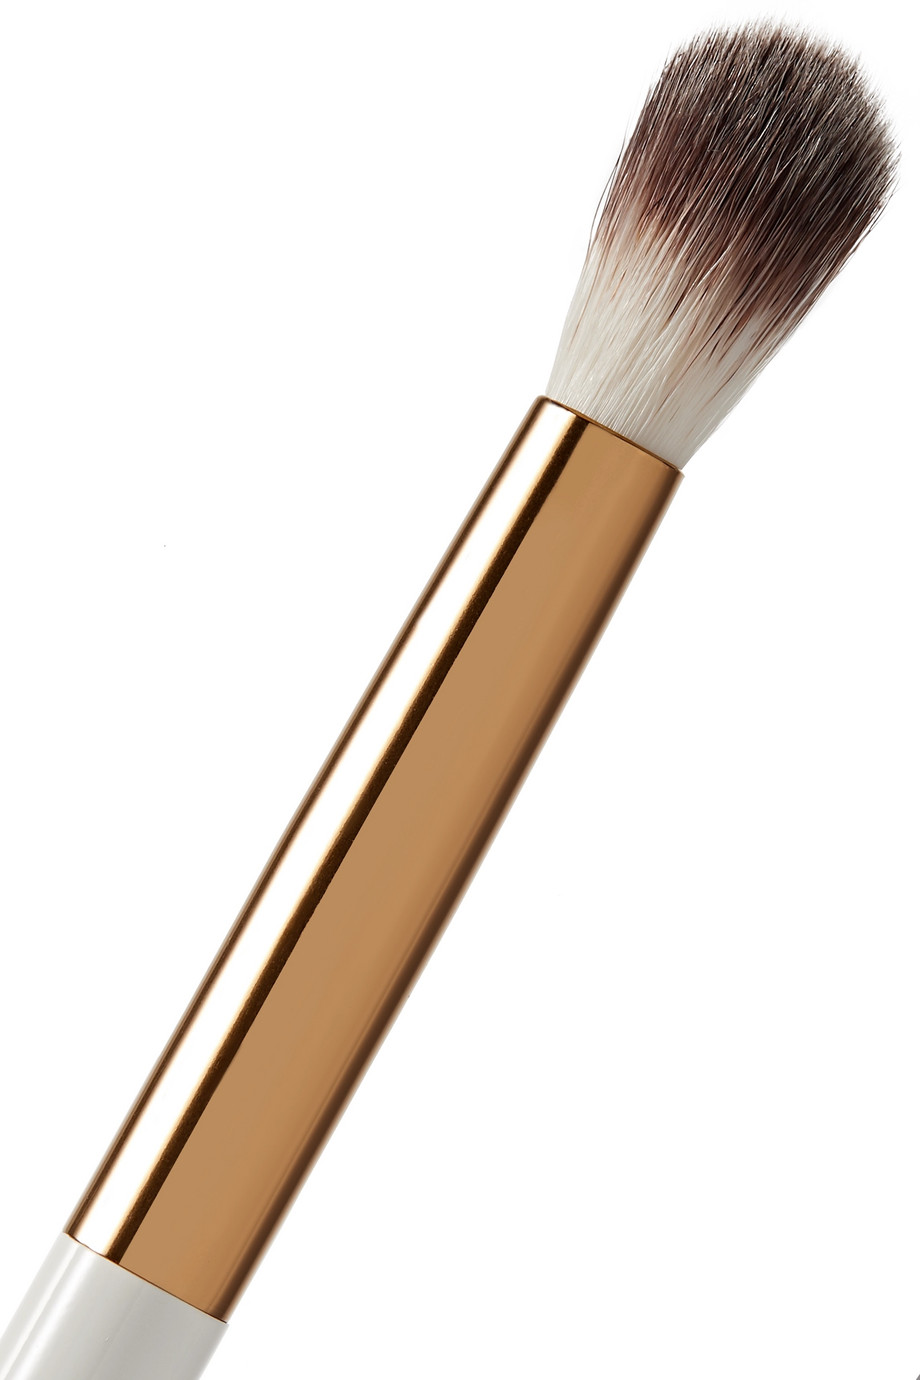 Lilah B. Crease Brush #4